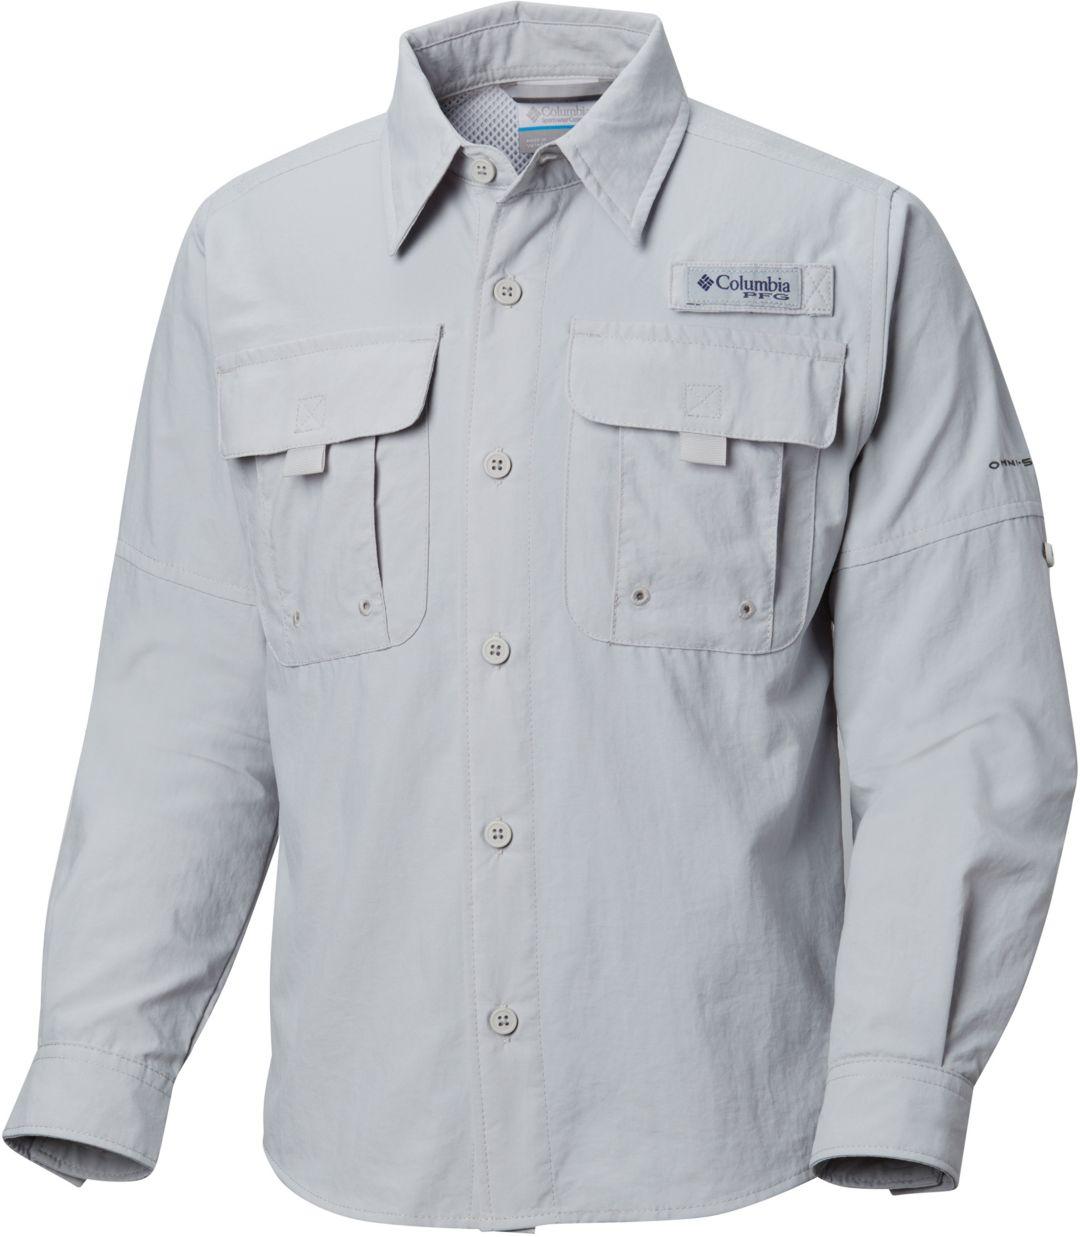 219f15e4c14 Columbia Boys' PFG Bahama Long Sleeve Shirt | DICK'S Sporting Goods